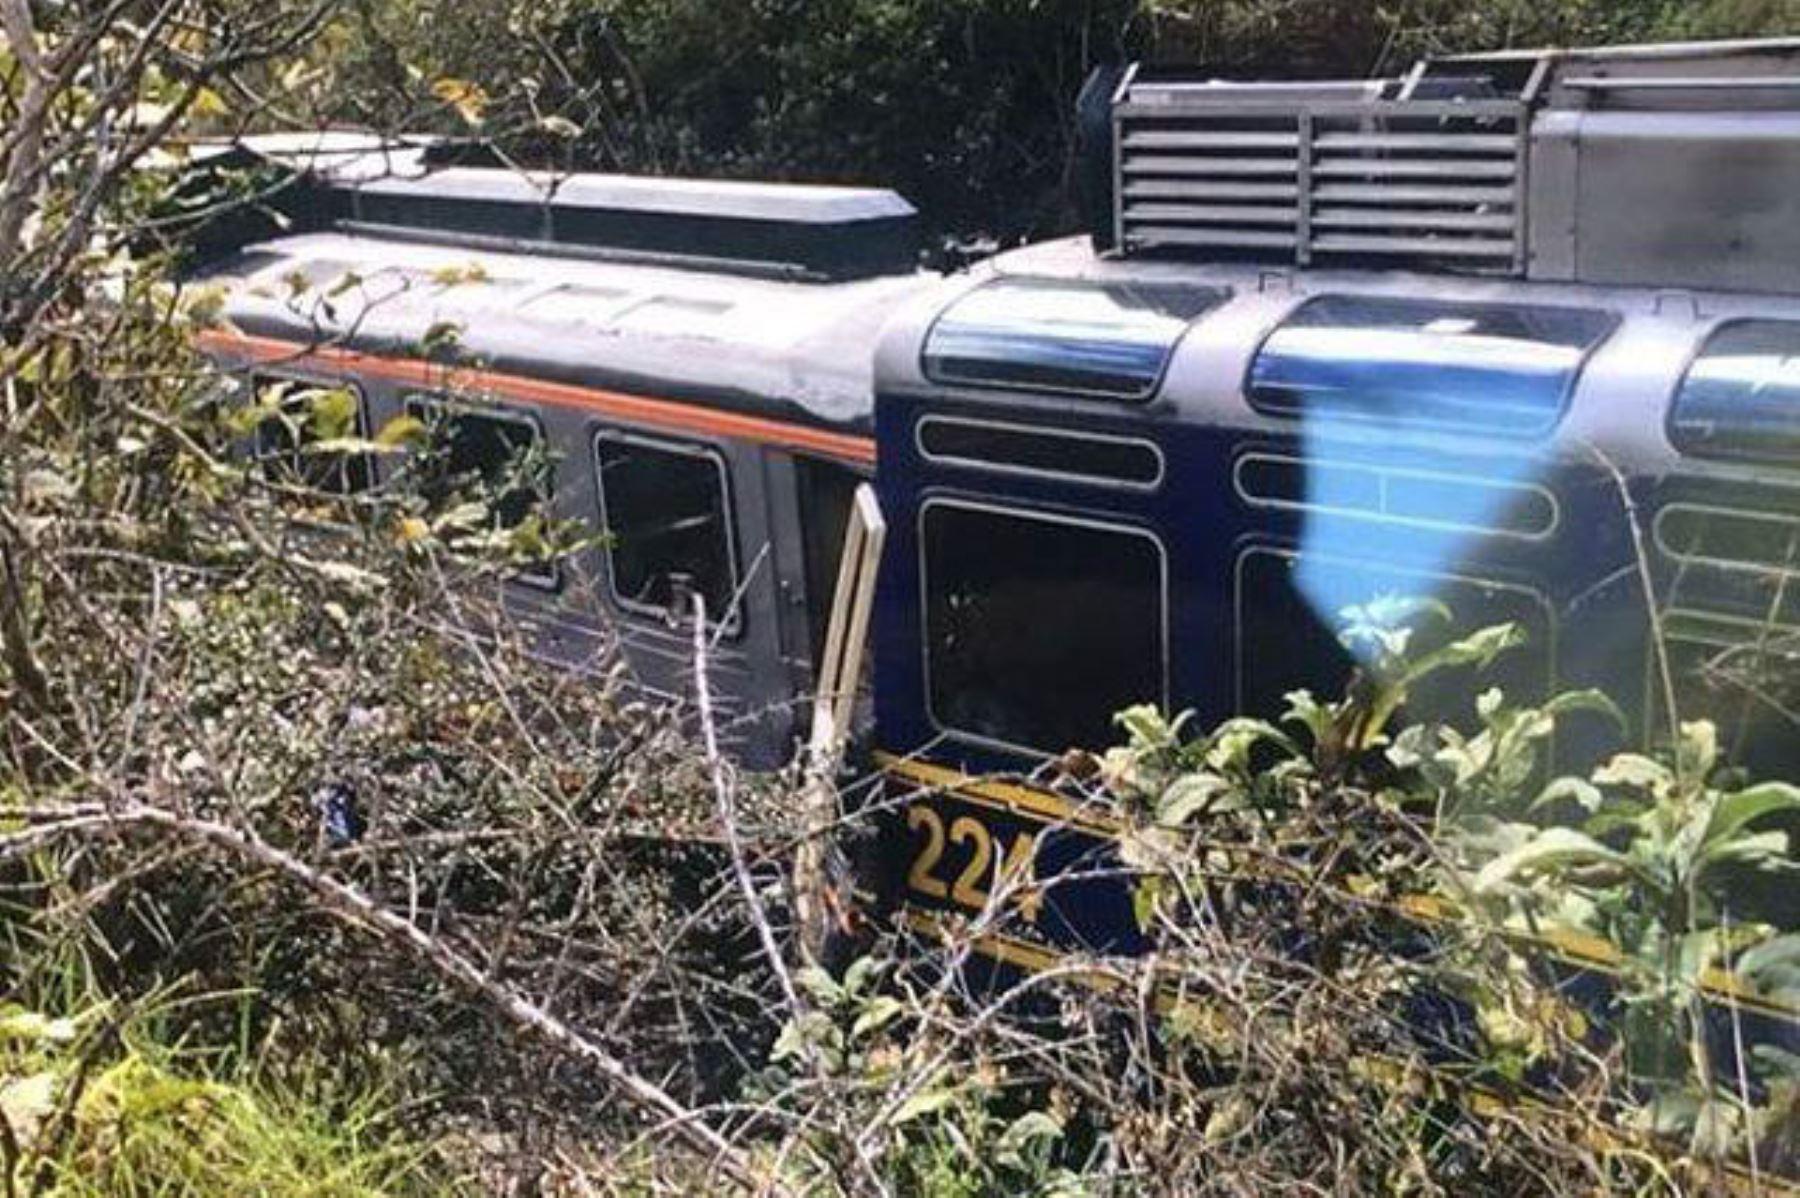 Reportan choque de trenes en vía a Machu Picchu. Foto: Cuscoen Portada/Facebook